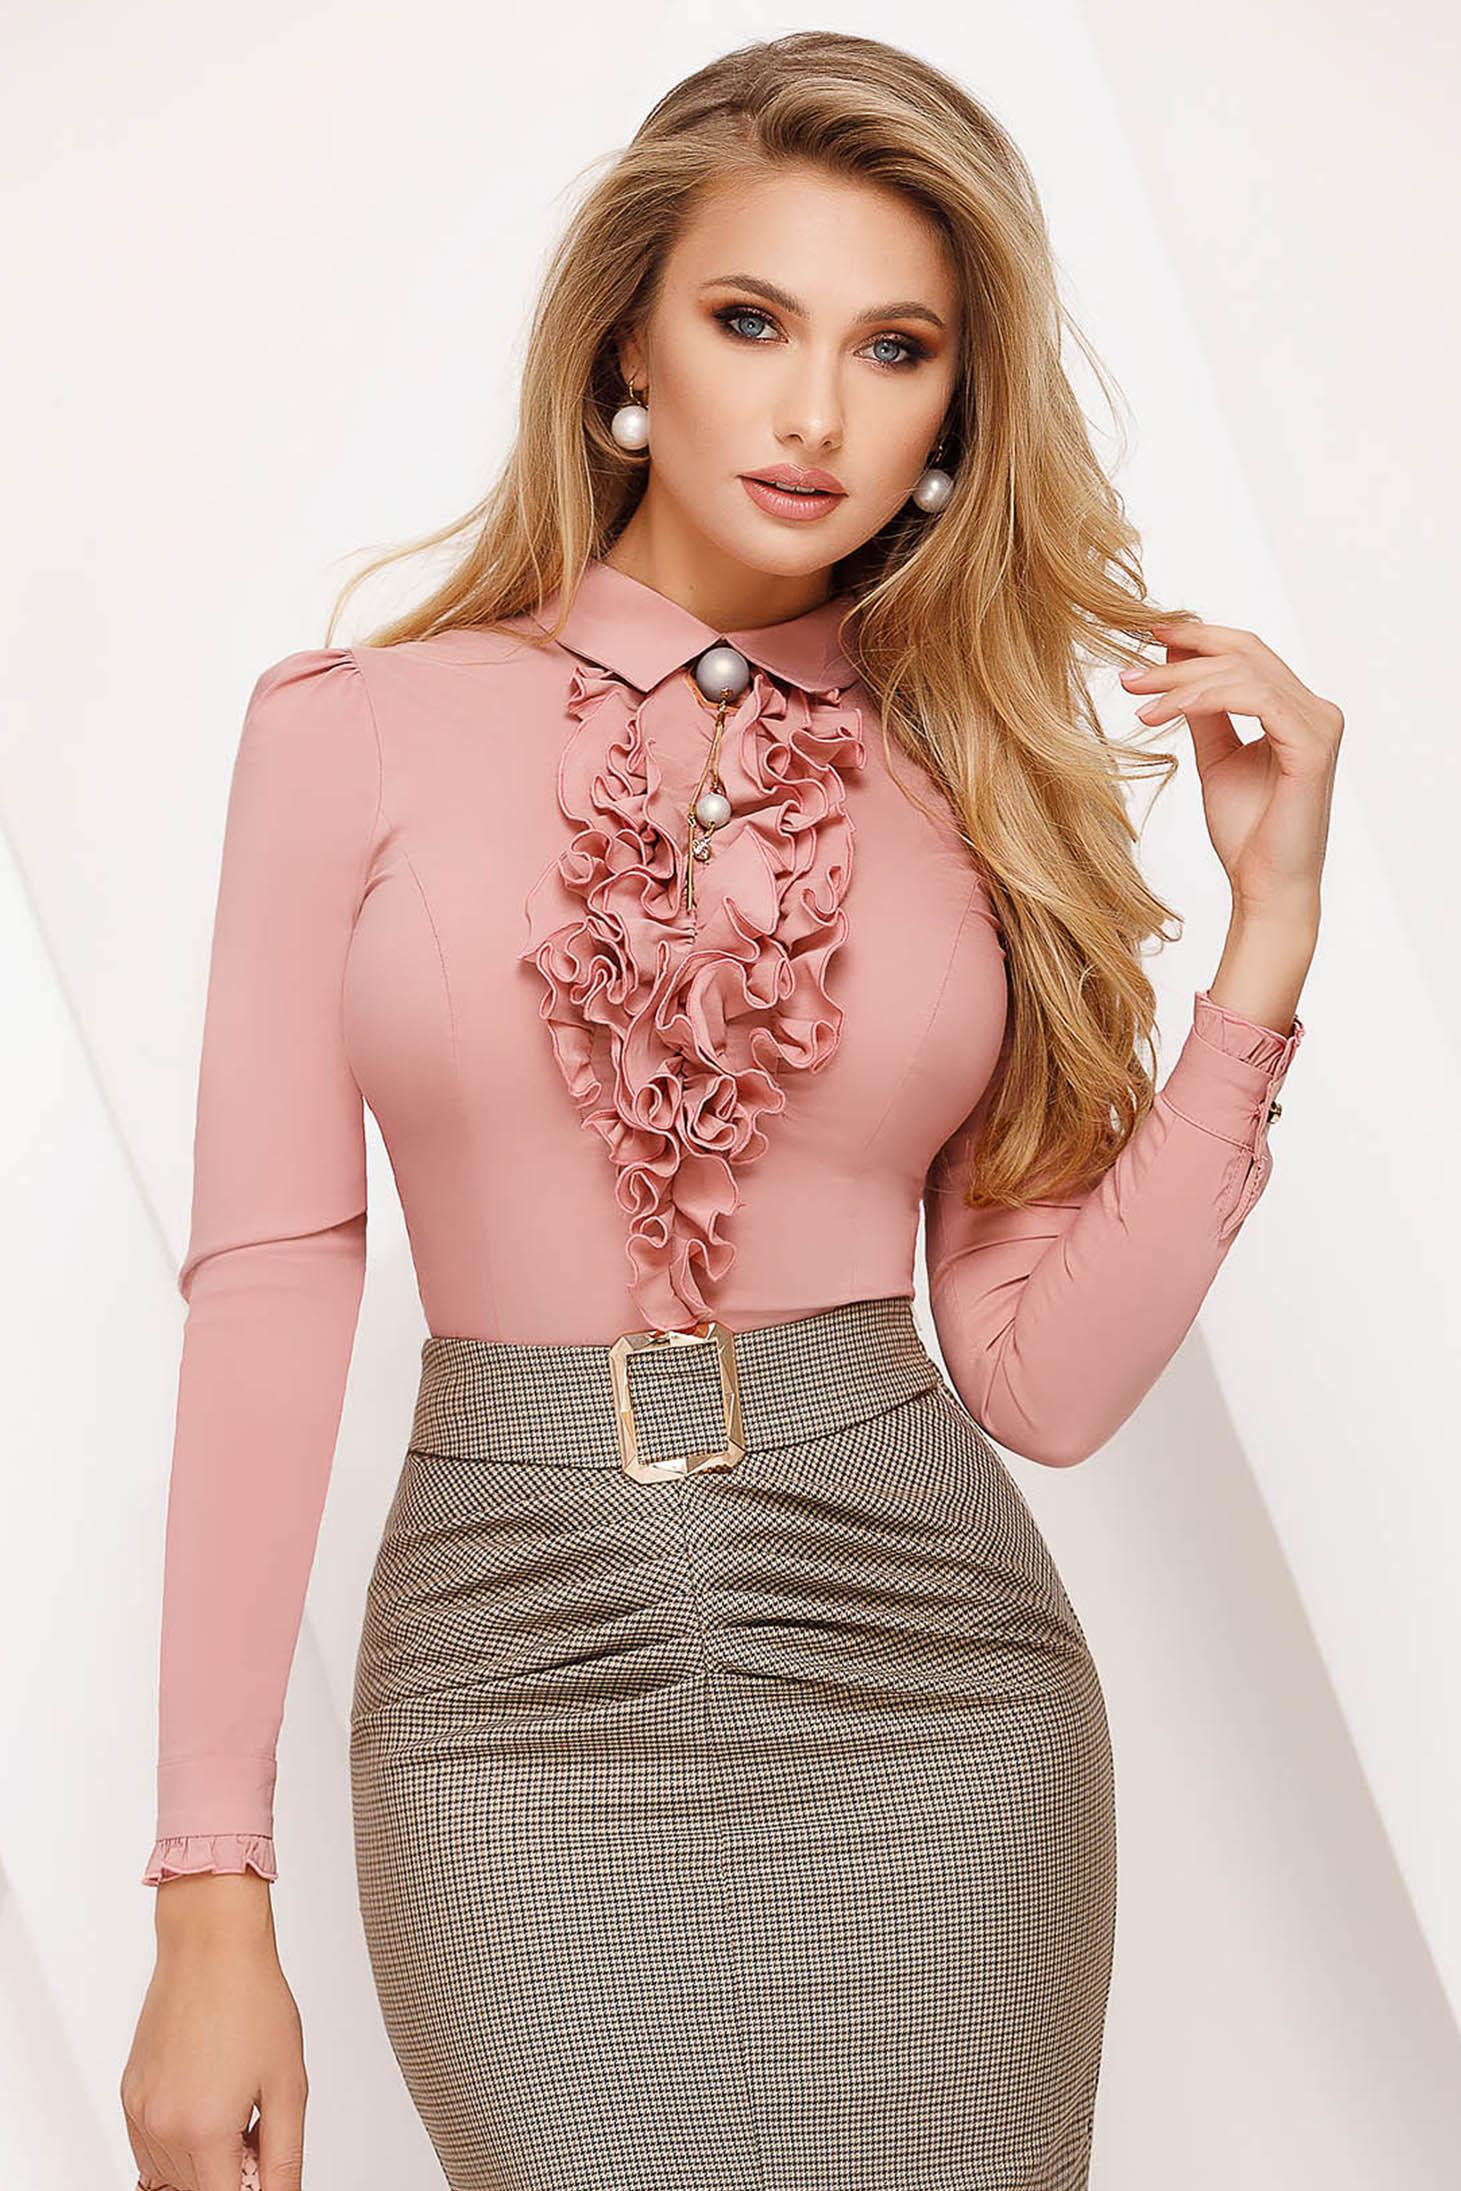 Bluza dama Fofy roz prafuit office mulata din bumbac cu volanase accesorizata cu brosa